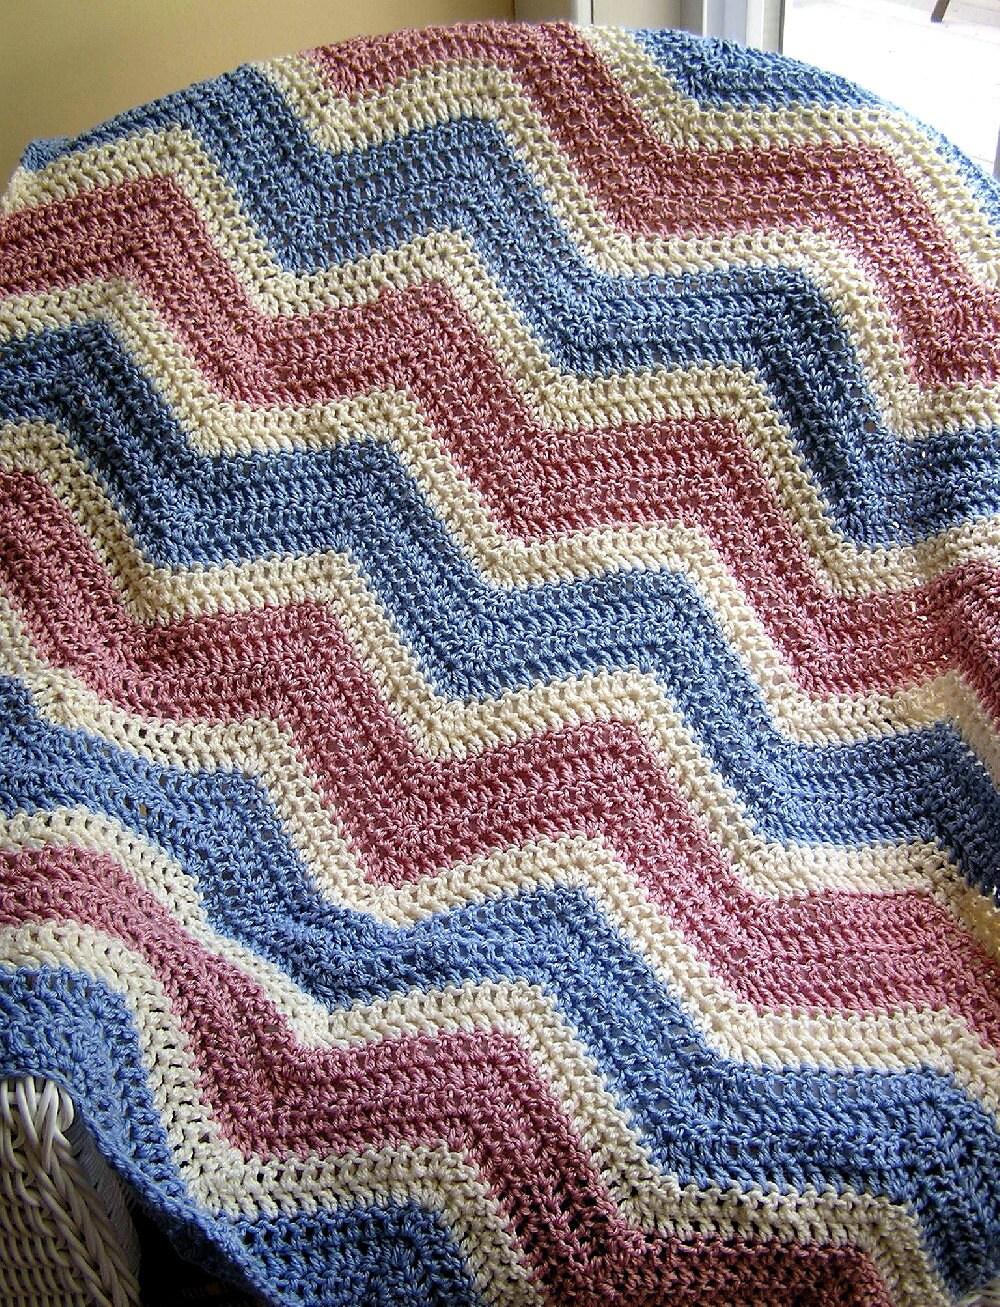 Knitting Pattern For Zig Zag Afghan : chevron zig zag baby blanket afghan wrap crochet knit ...